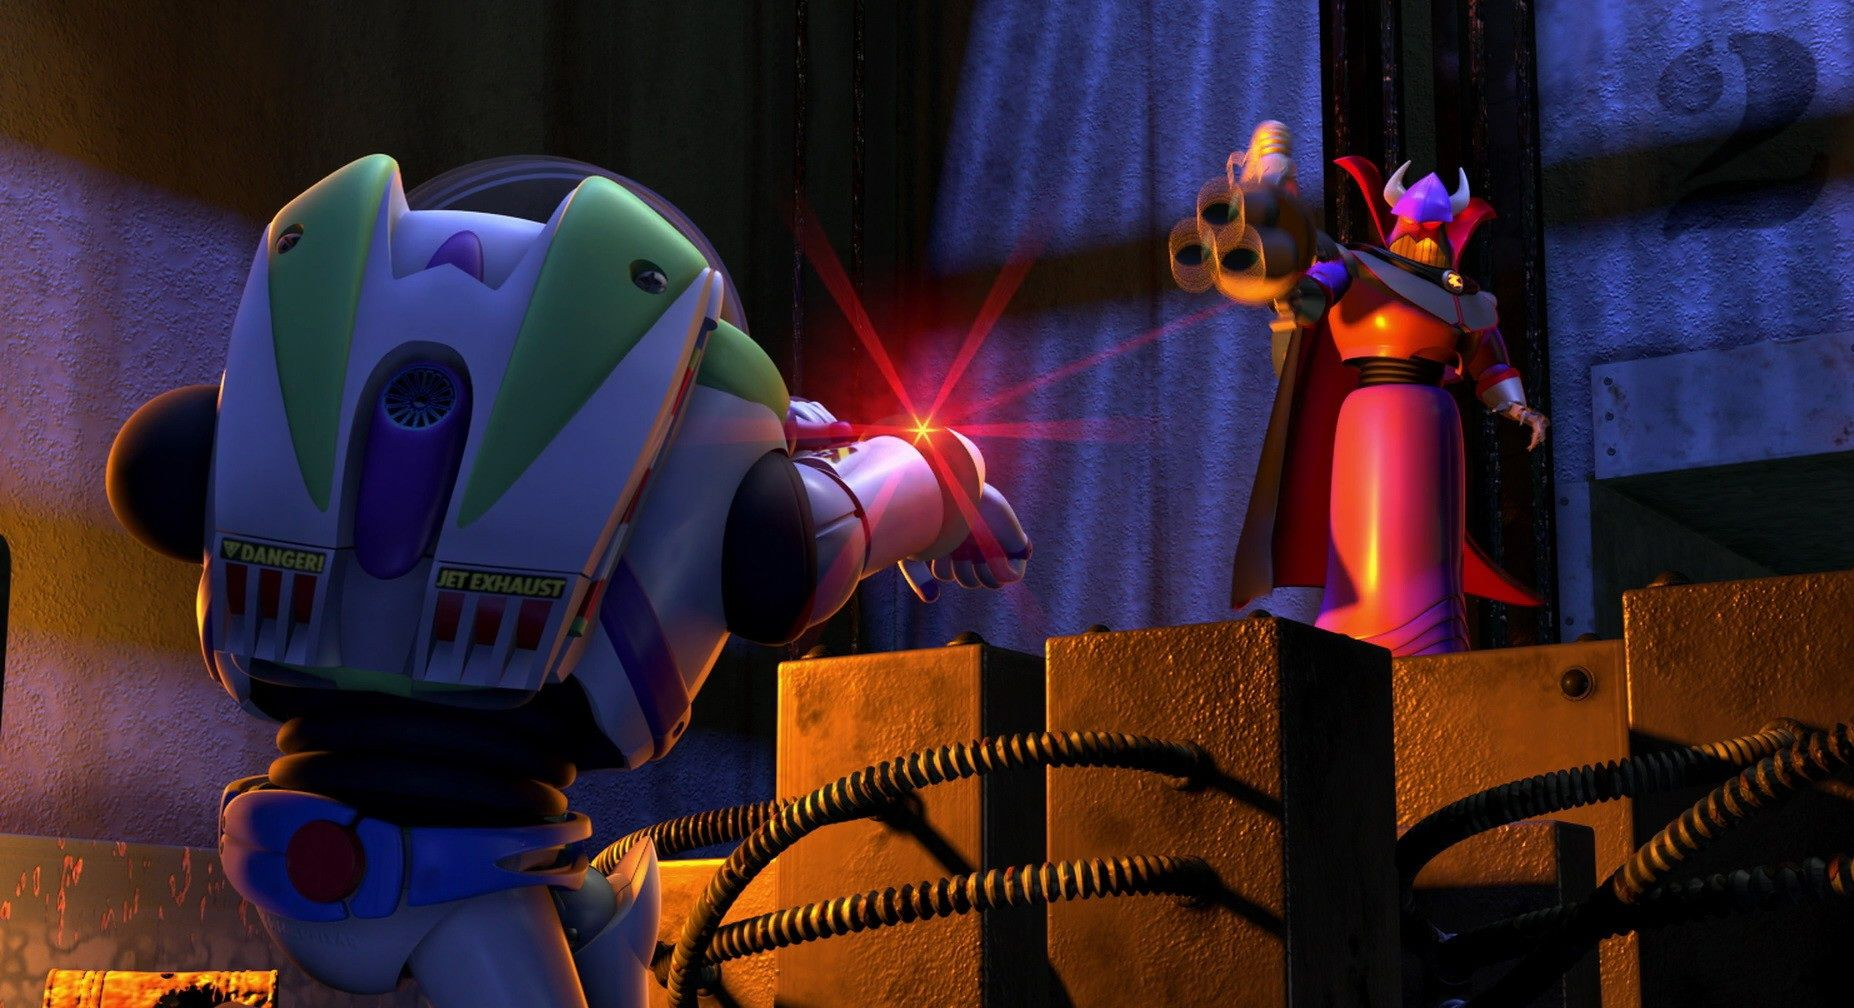 Toy story of terror 1 2 3 buzz lightyear of star command for sale - Toy Story Of Terror 1 2 3 Buzz Lightyear Of Star Command For Sale 31